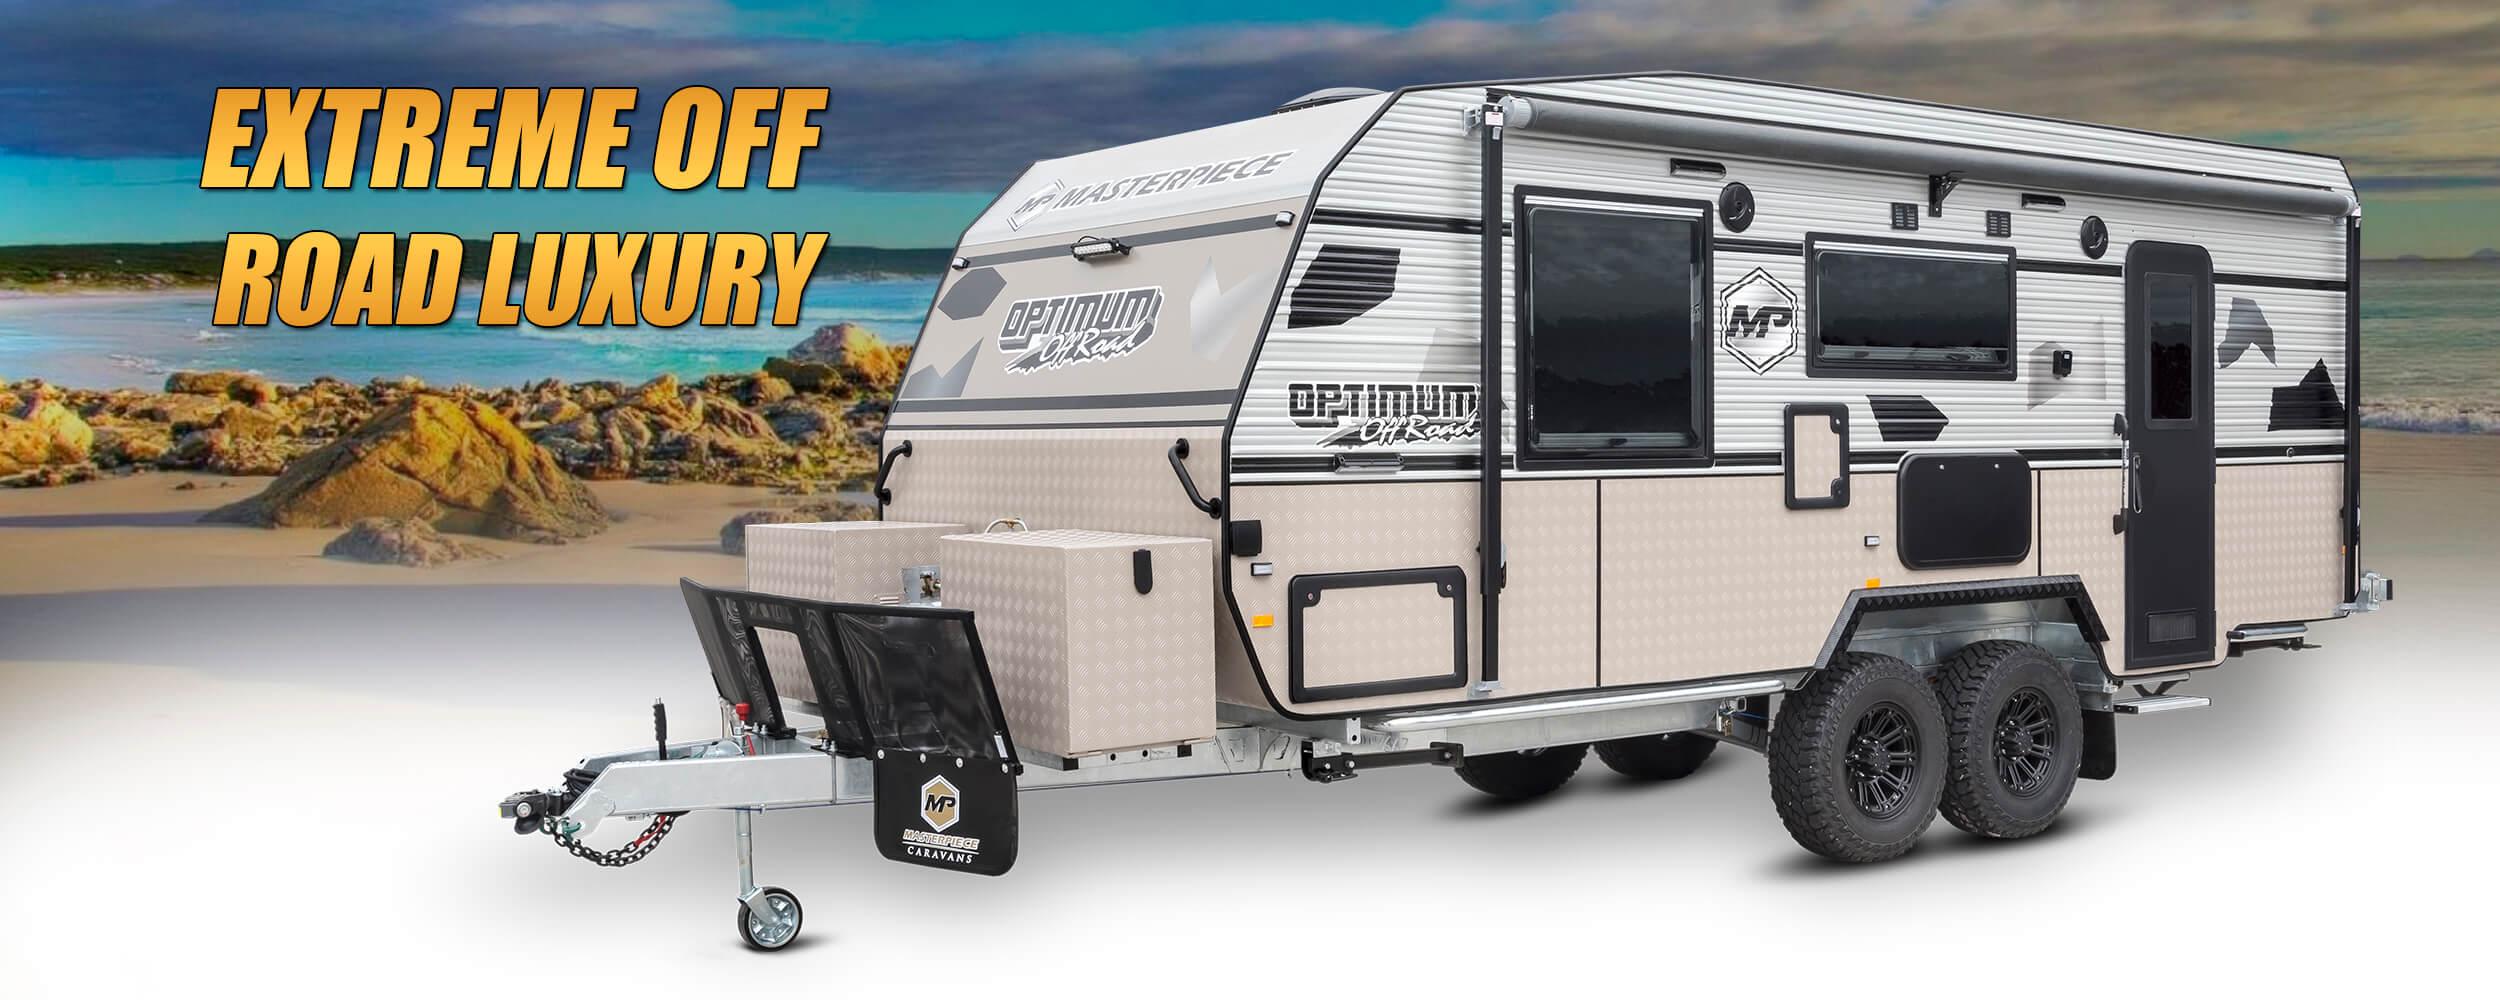 Optimum - Extreme Luxury Off Road Caravan